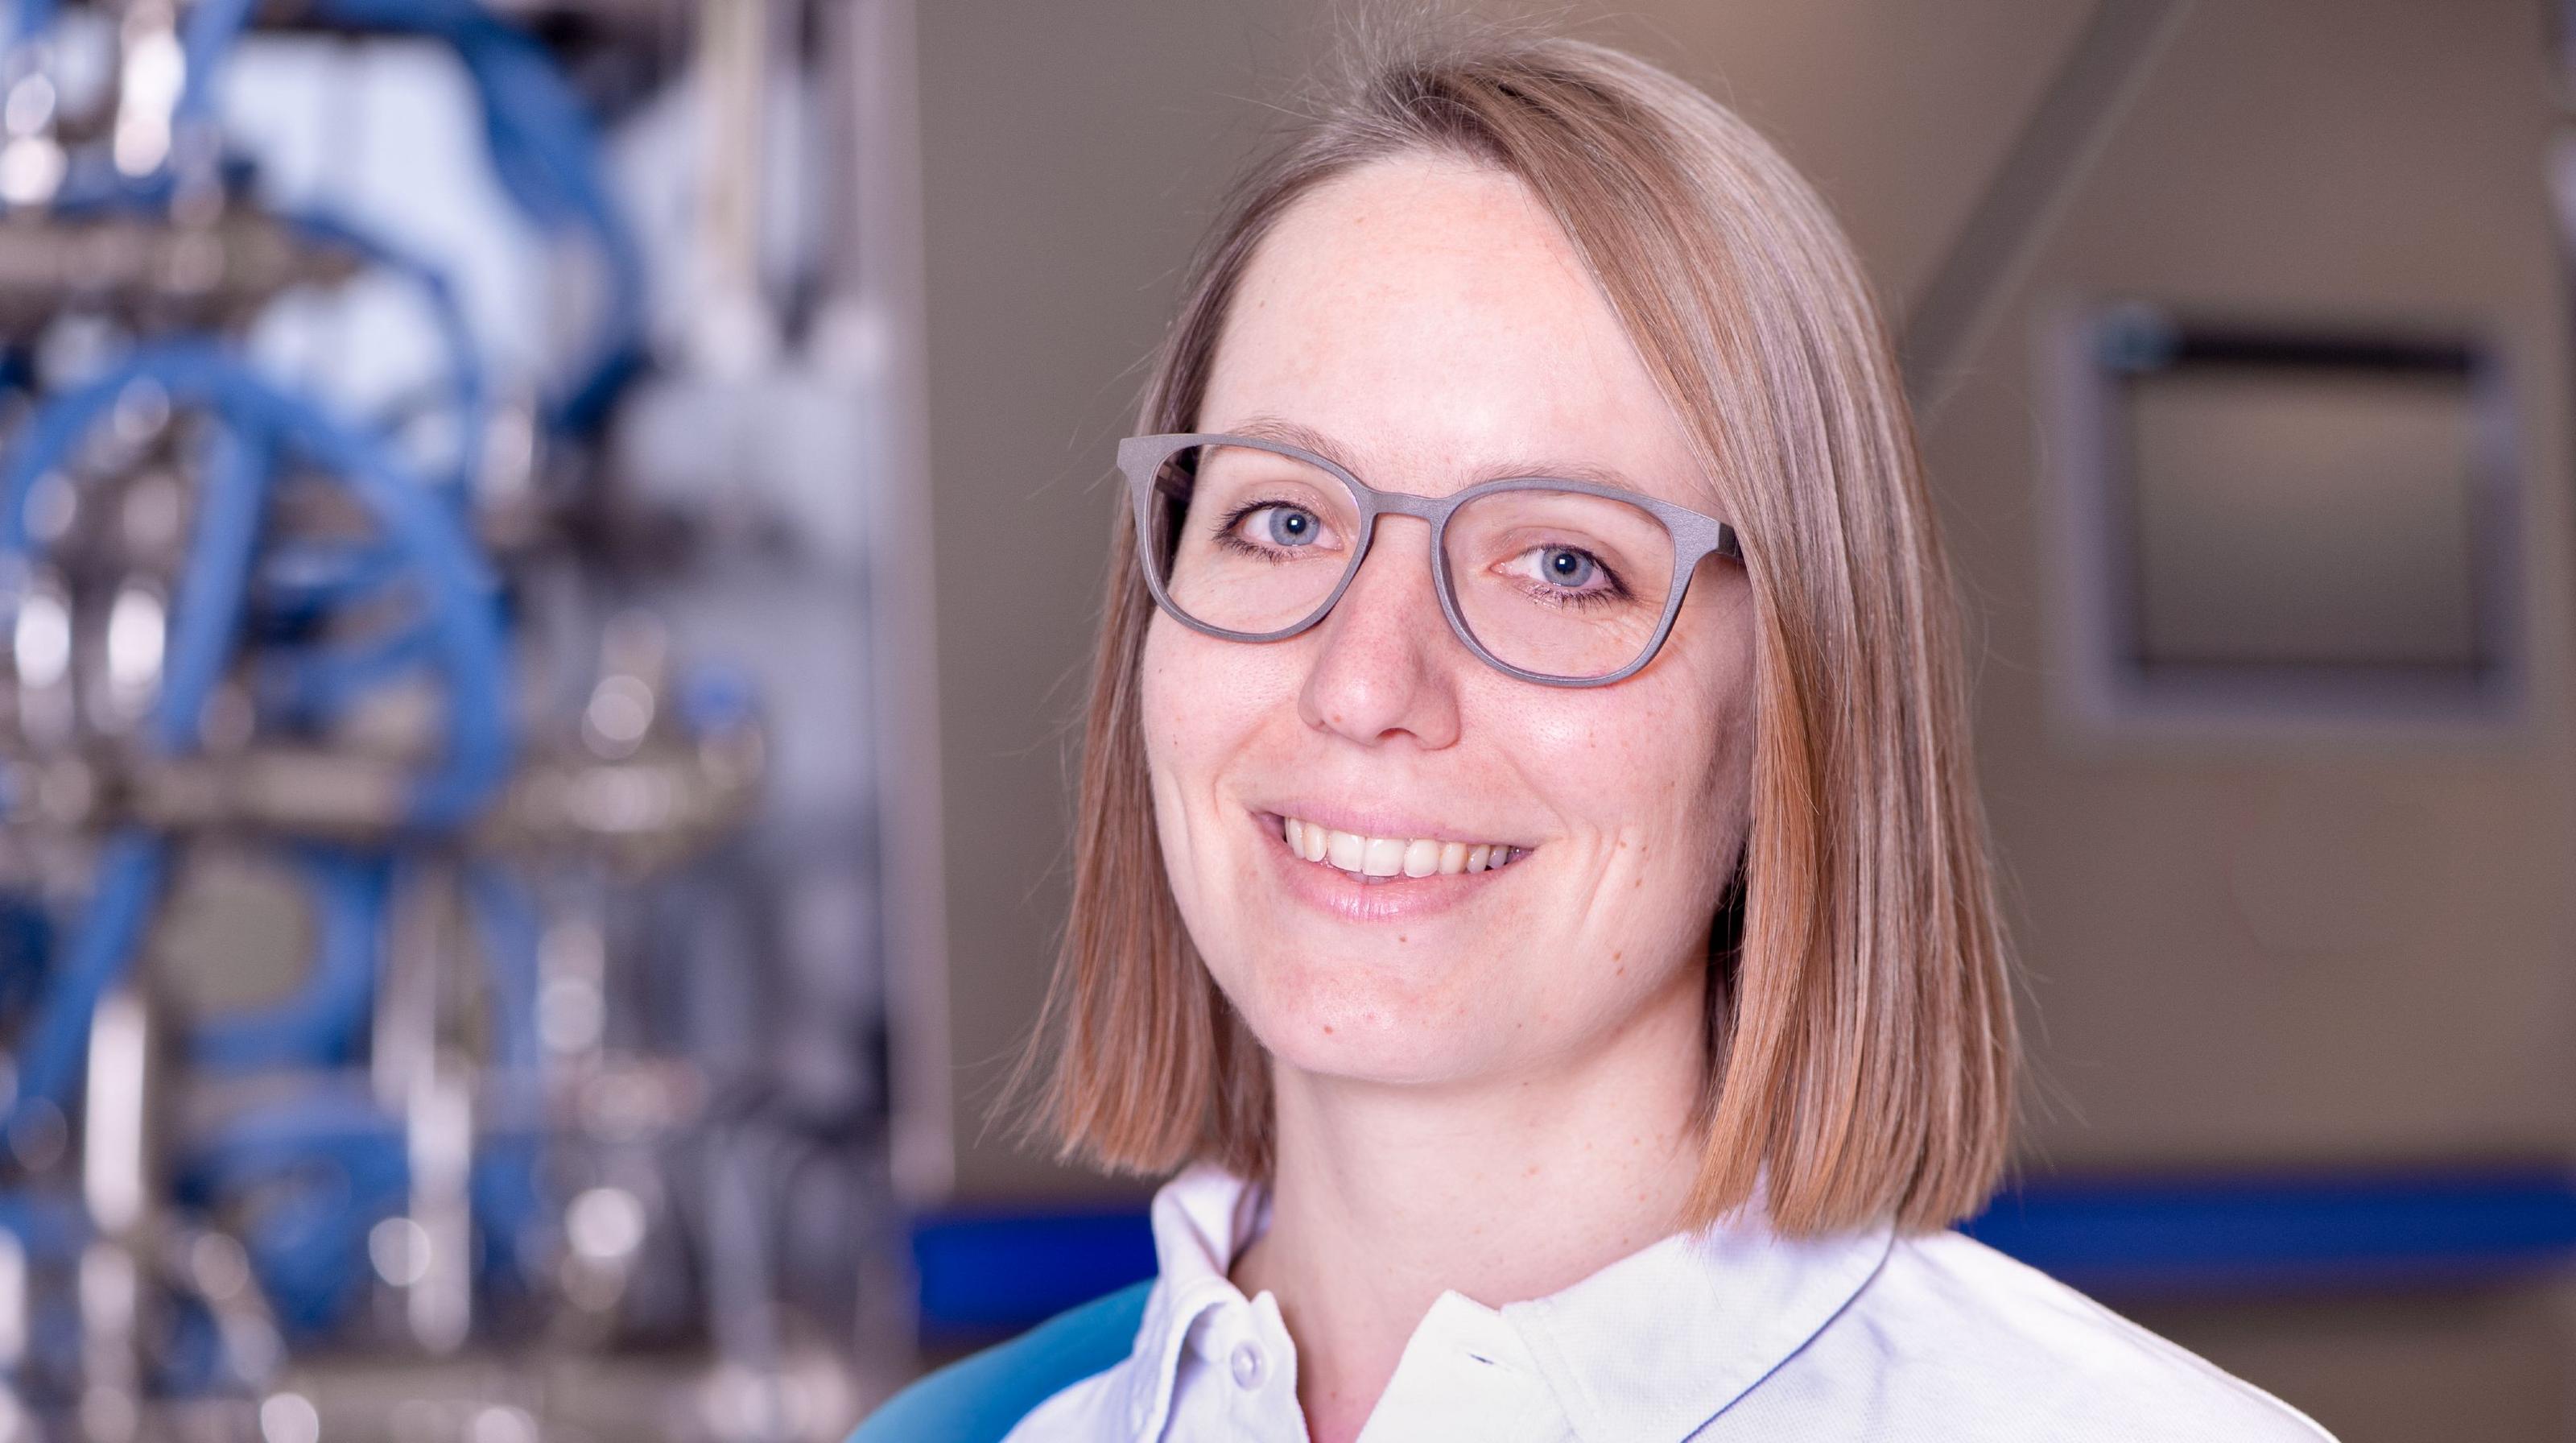 Jana Mäschle, experta y tecnóloga de Bühler.